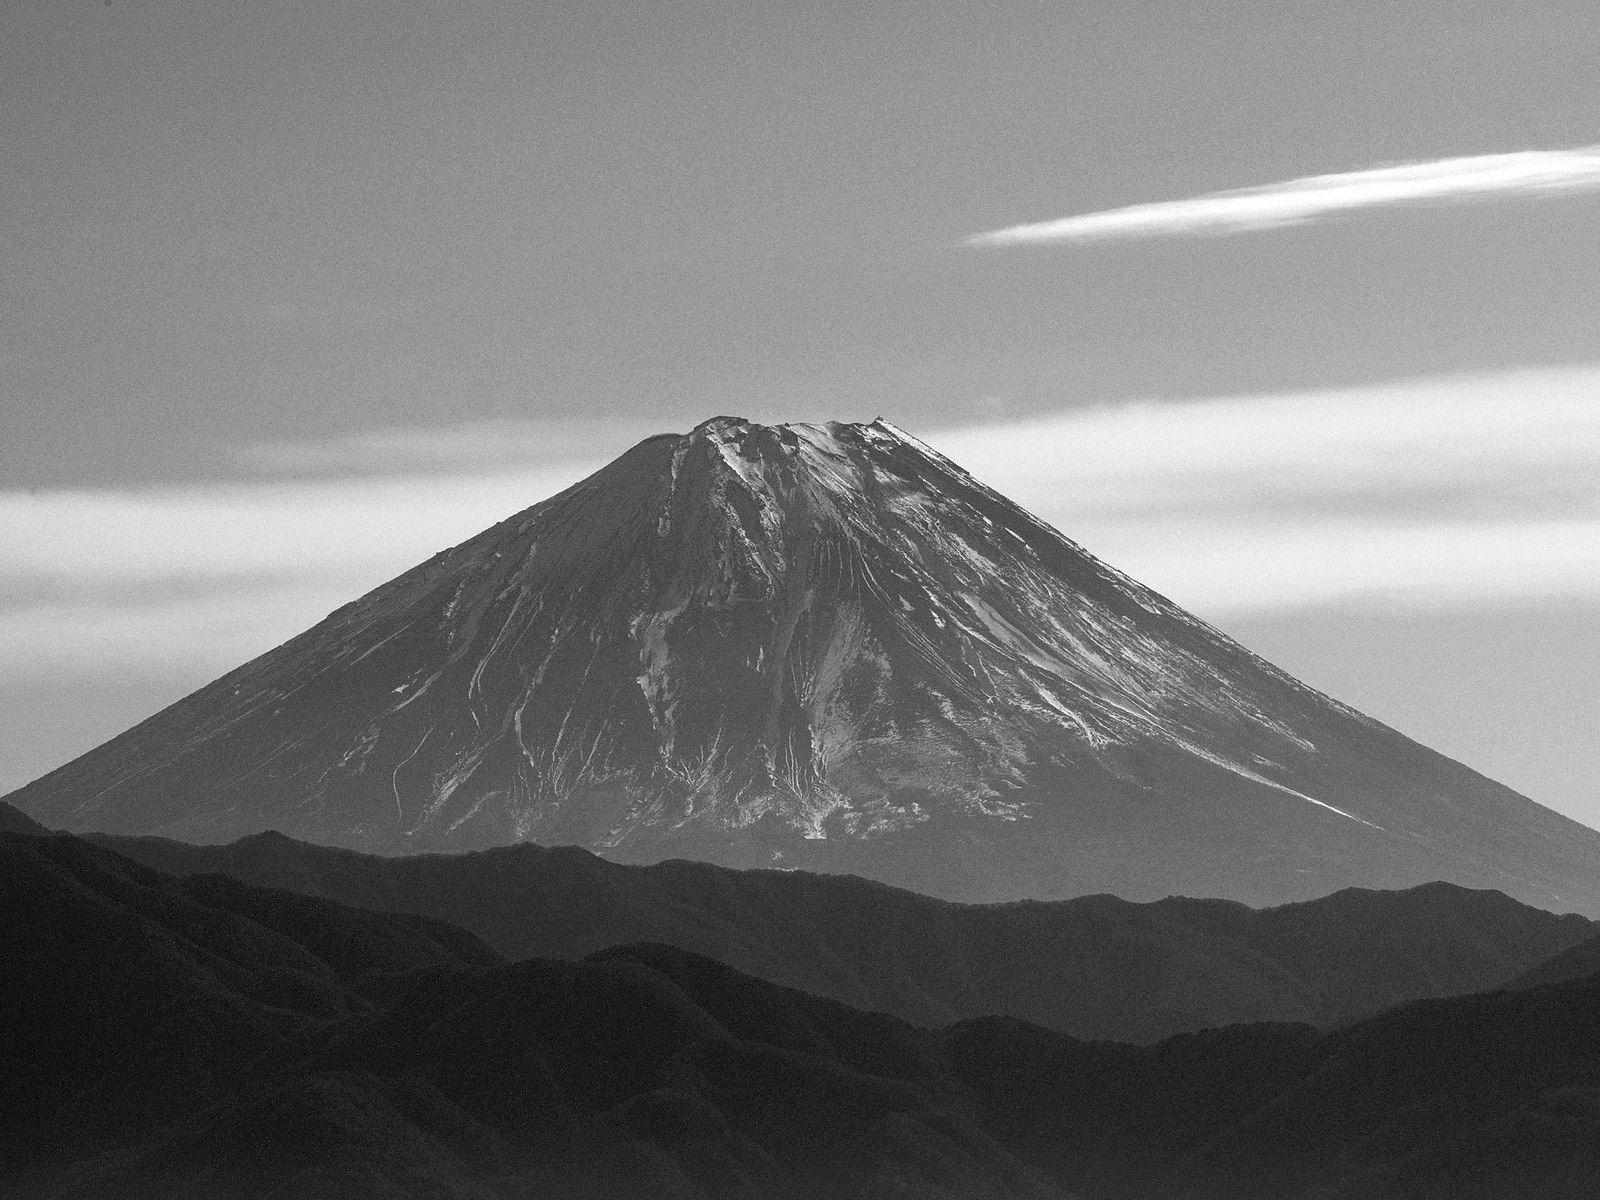 Monochrome Mt. Fuji from Hokuto [OC] [1600x1200] 北杜市から白黒富士山